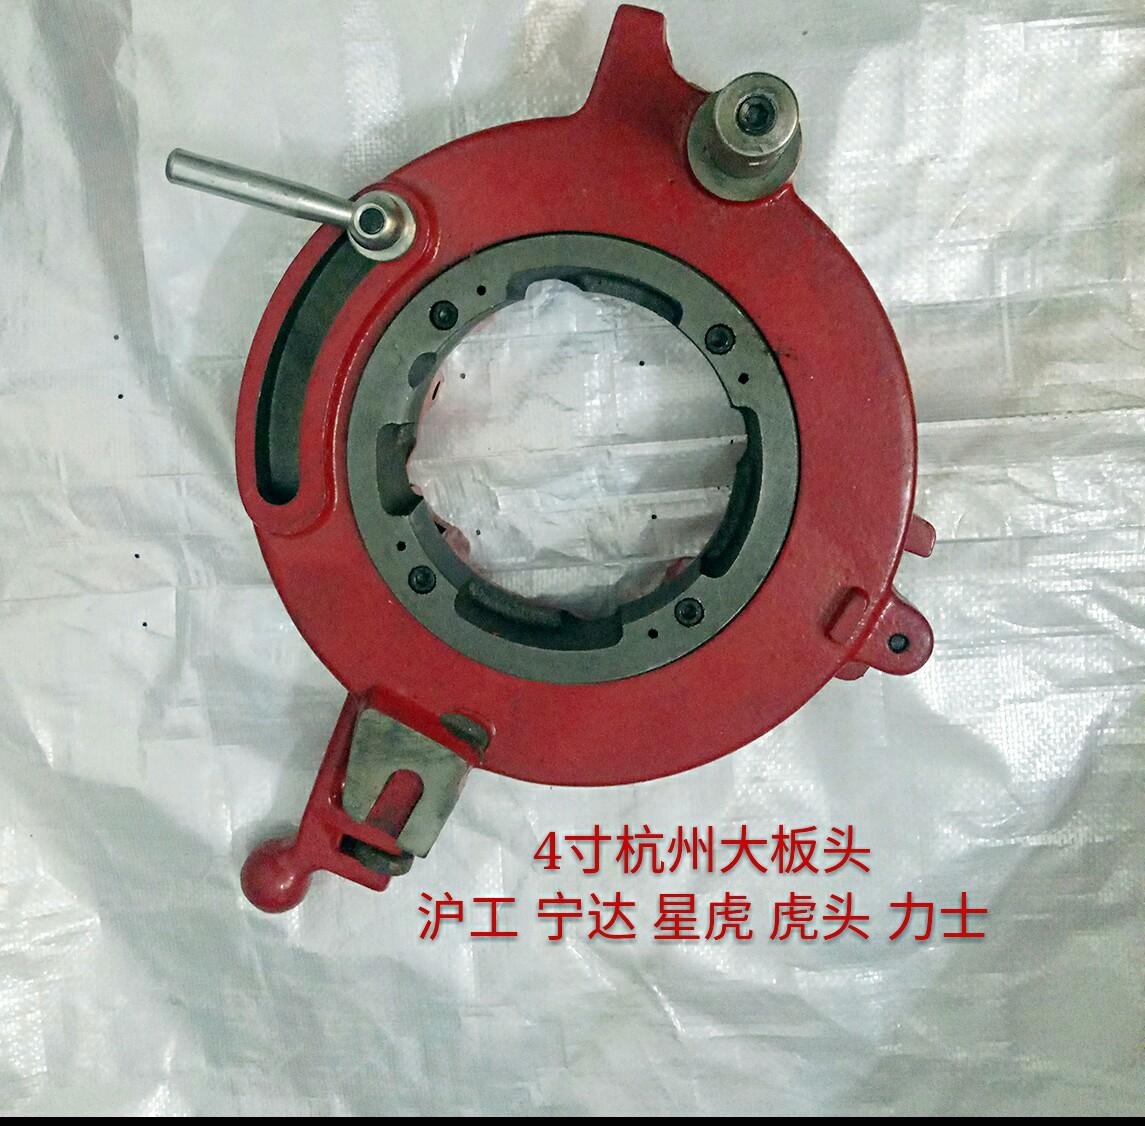 2-3-4 inch Shanghai die head threading machine electric threading machine die head threading machine size